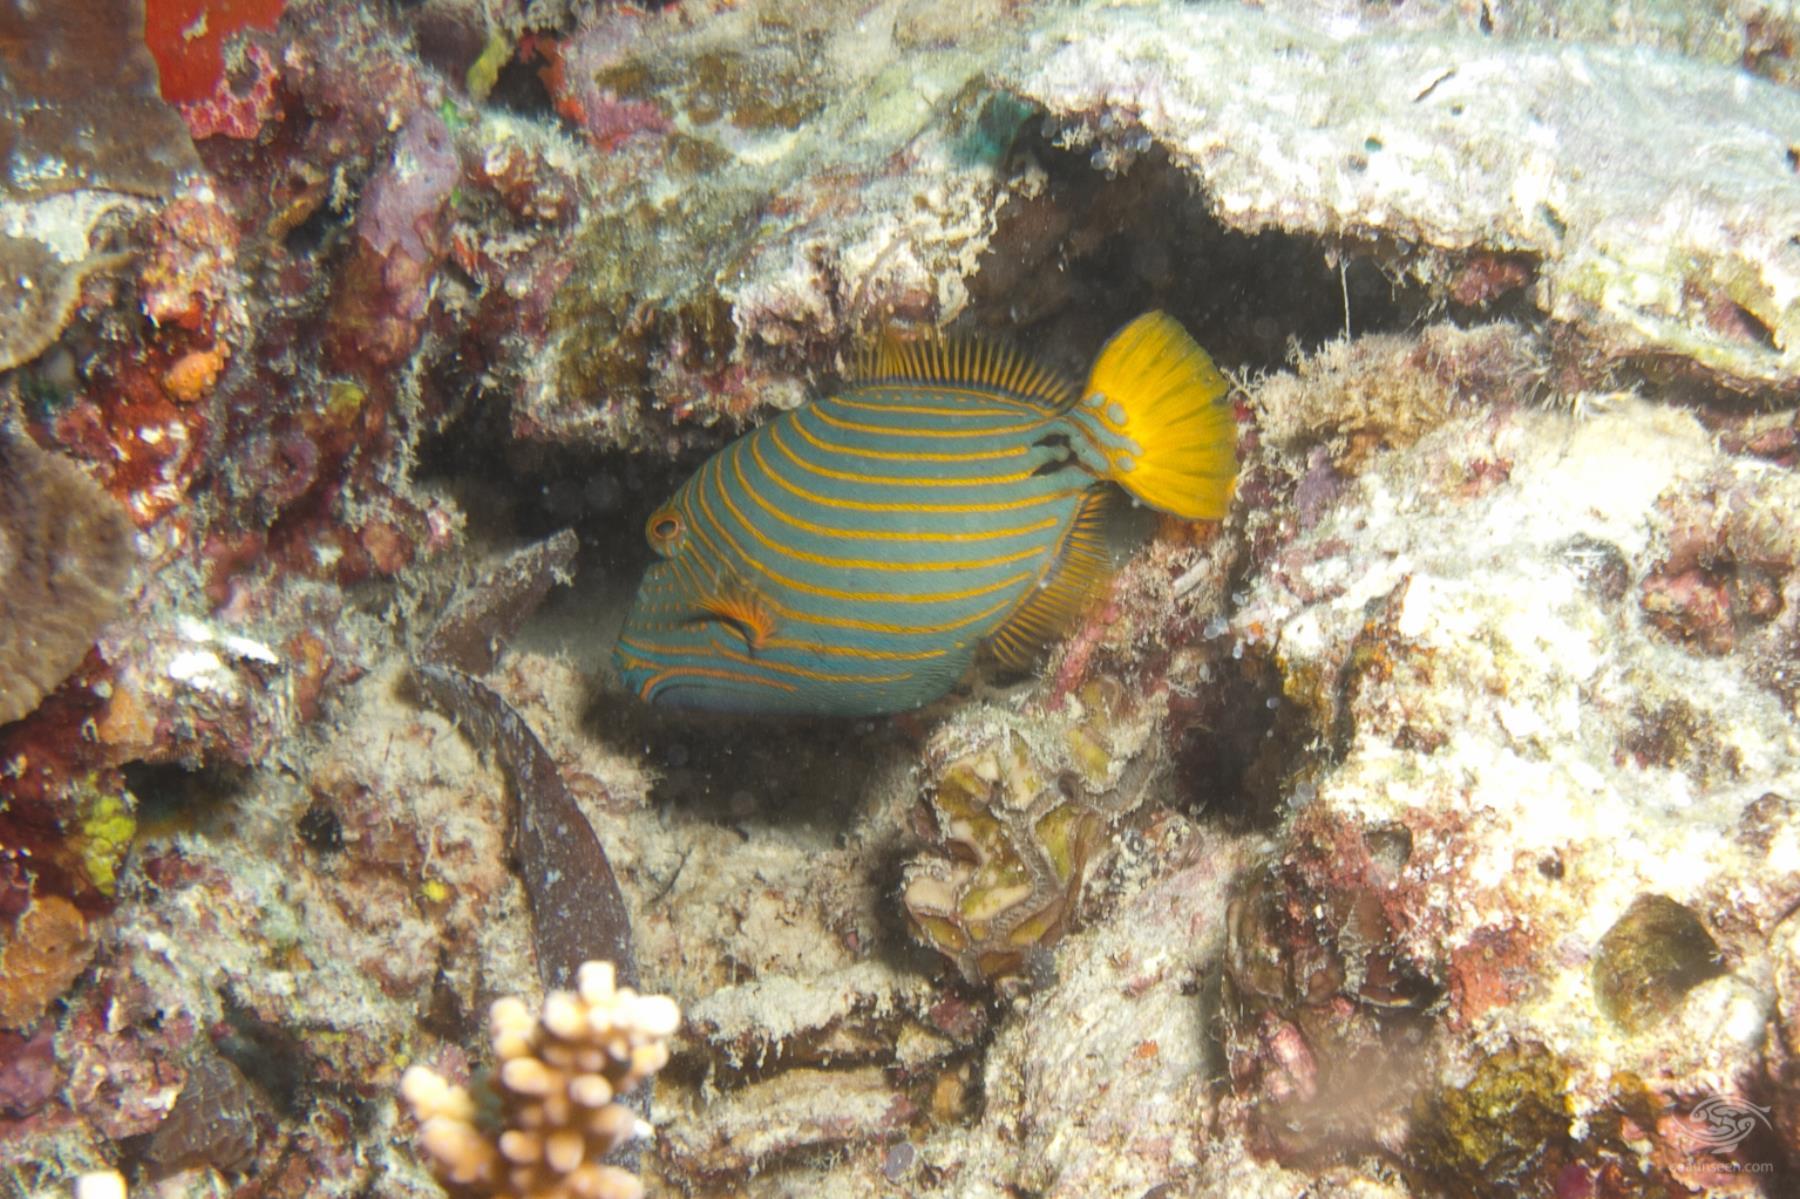 Juvenile Orangelined Triggerfish Balistapus undulatus